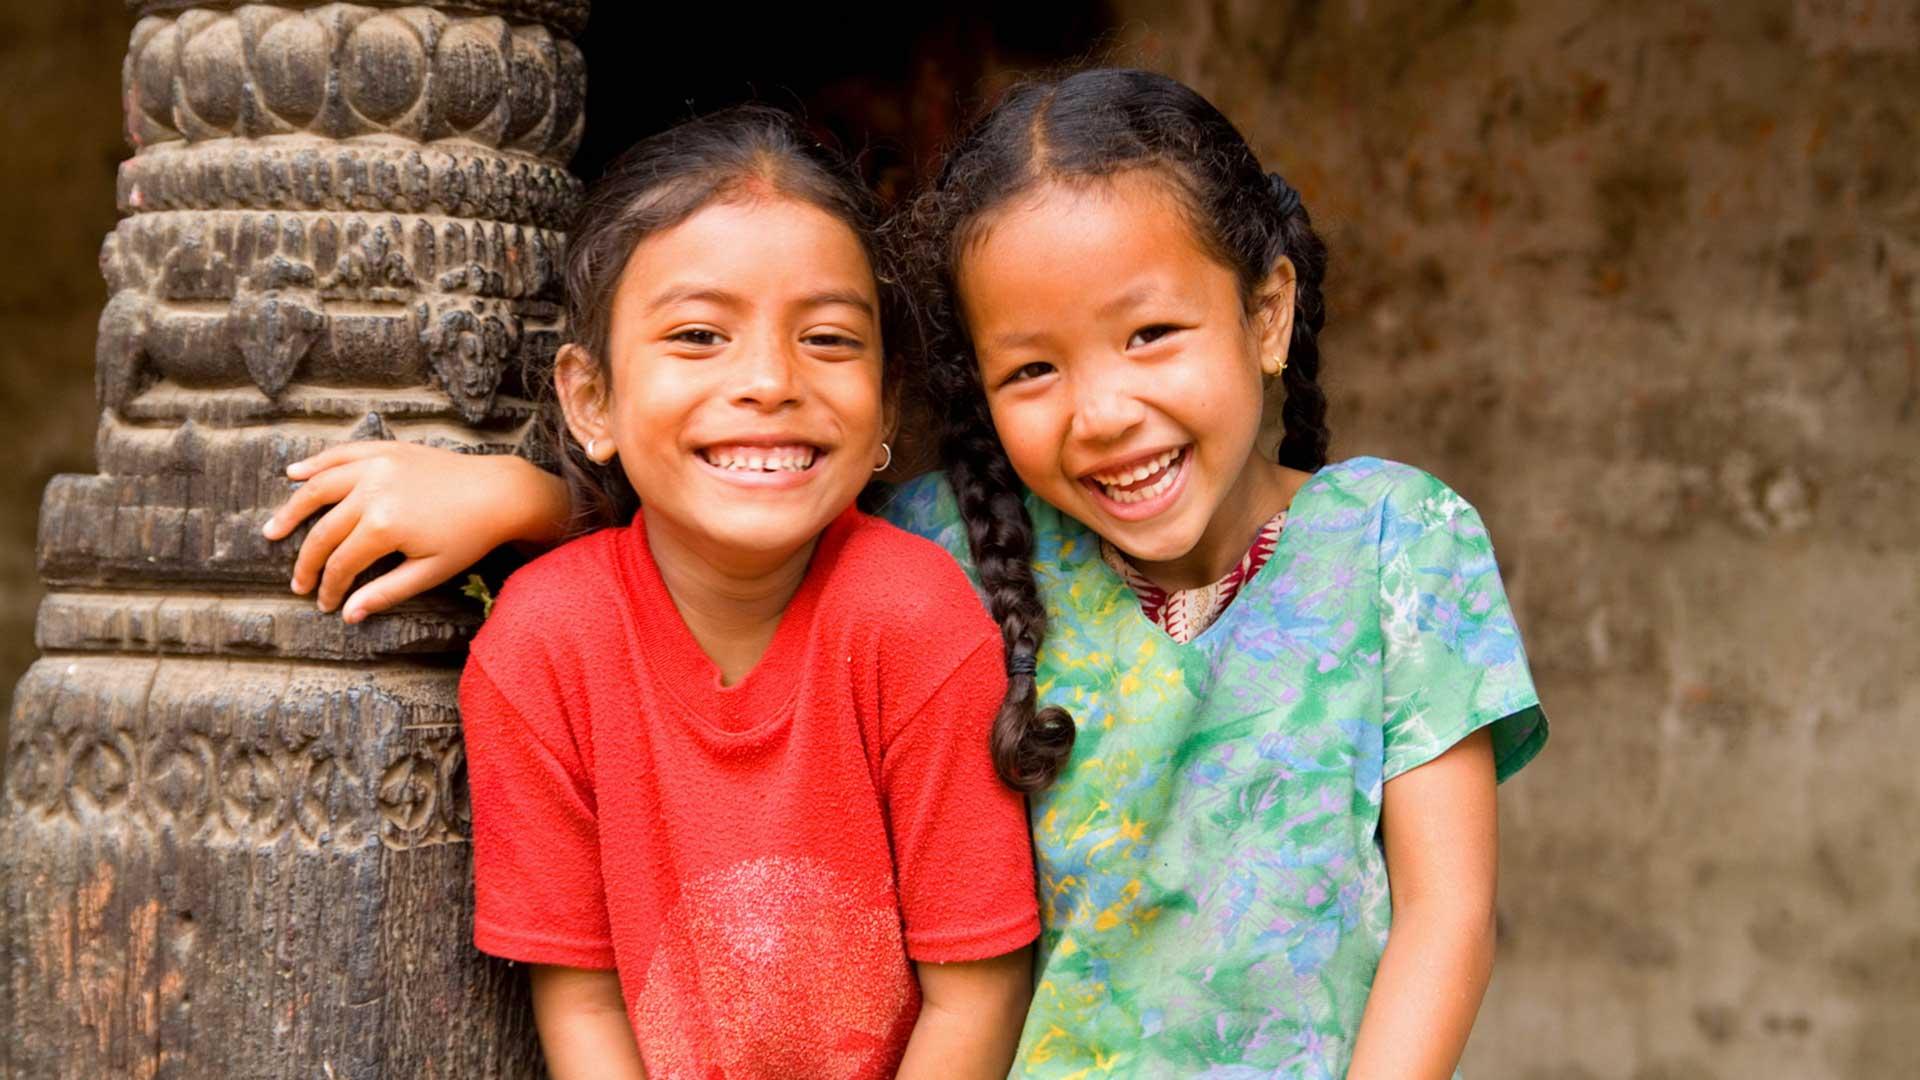 Local girls in village of Bhaktapur